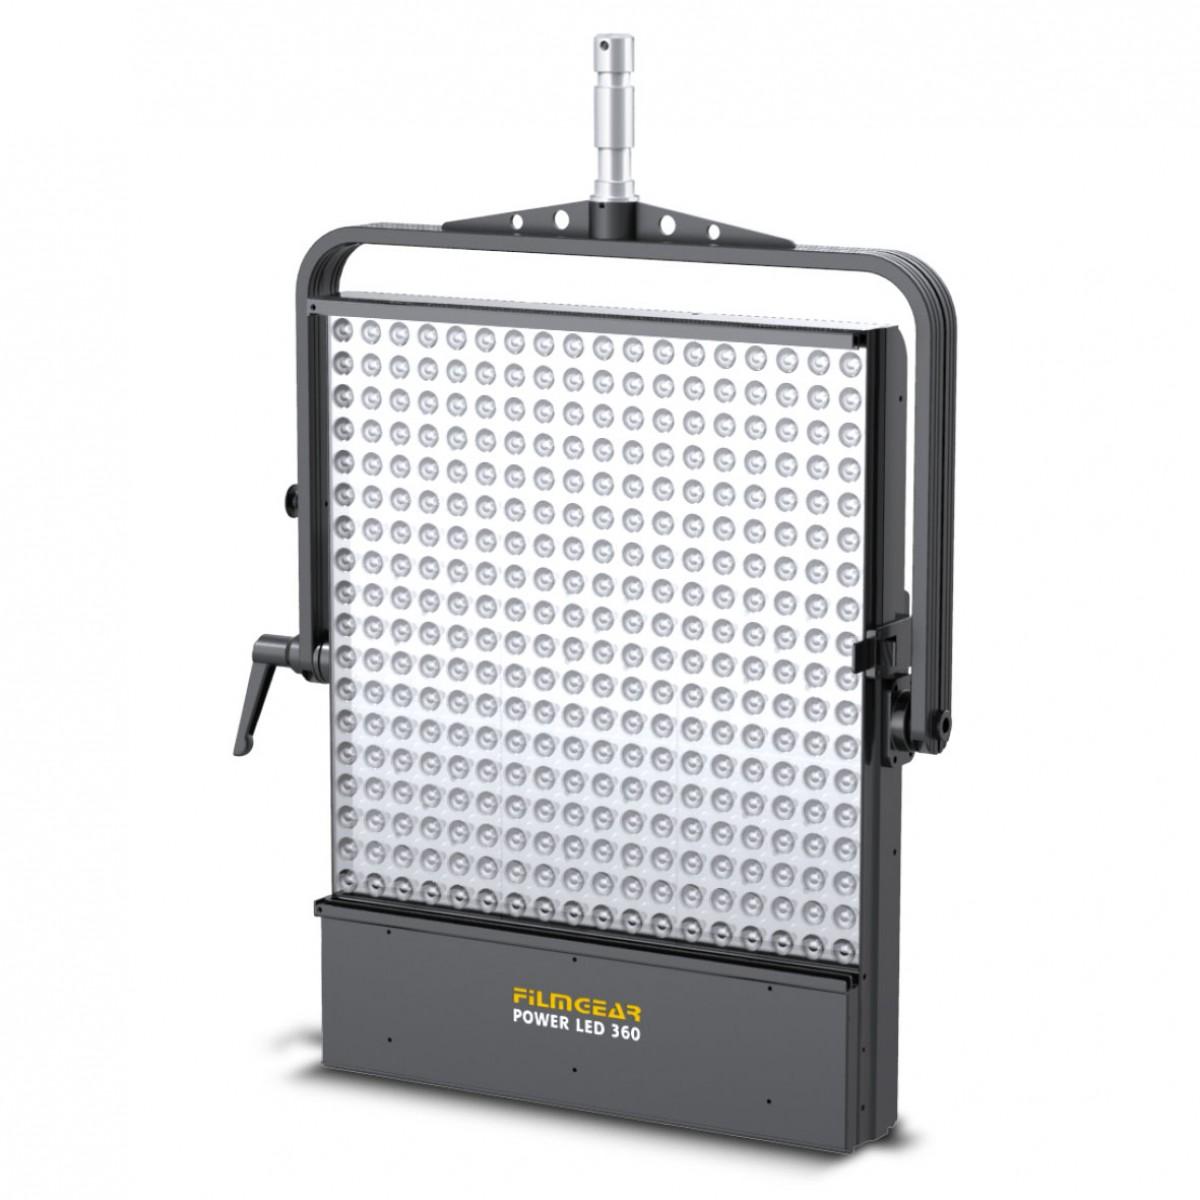 FilmGear LED360